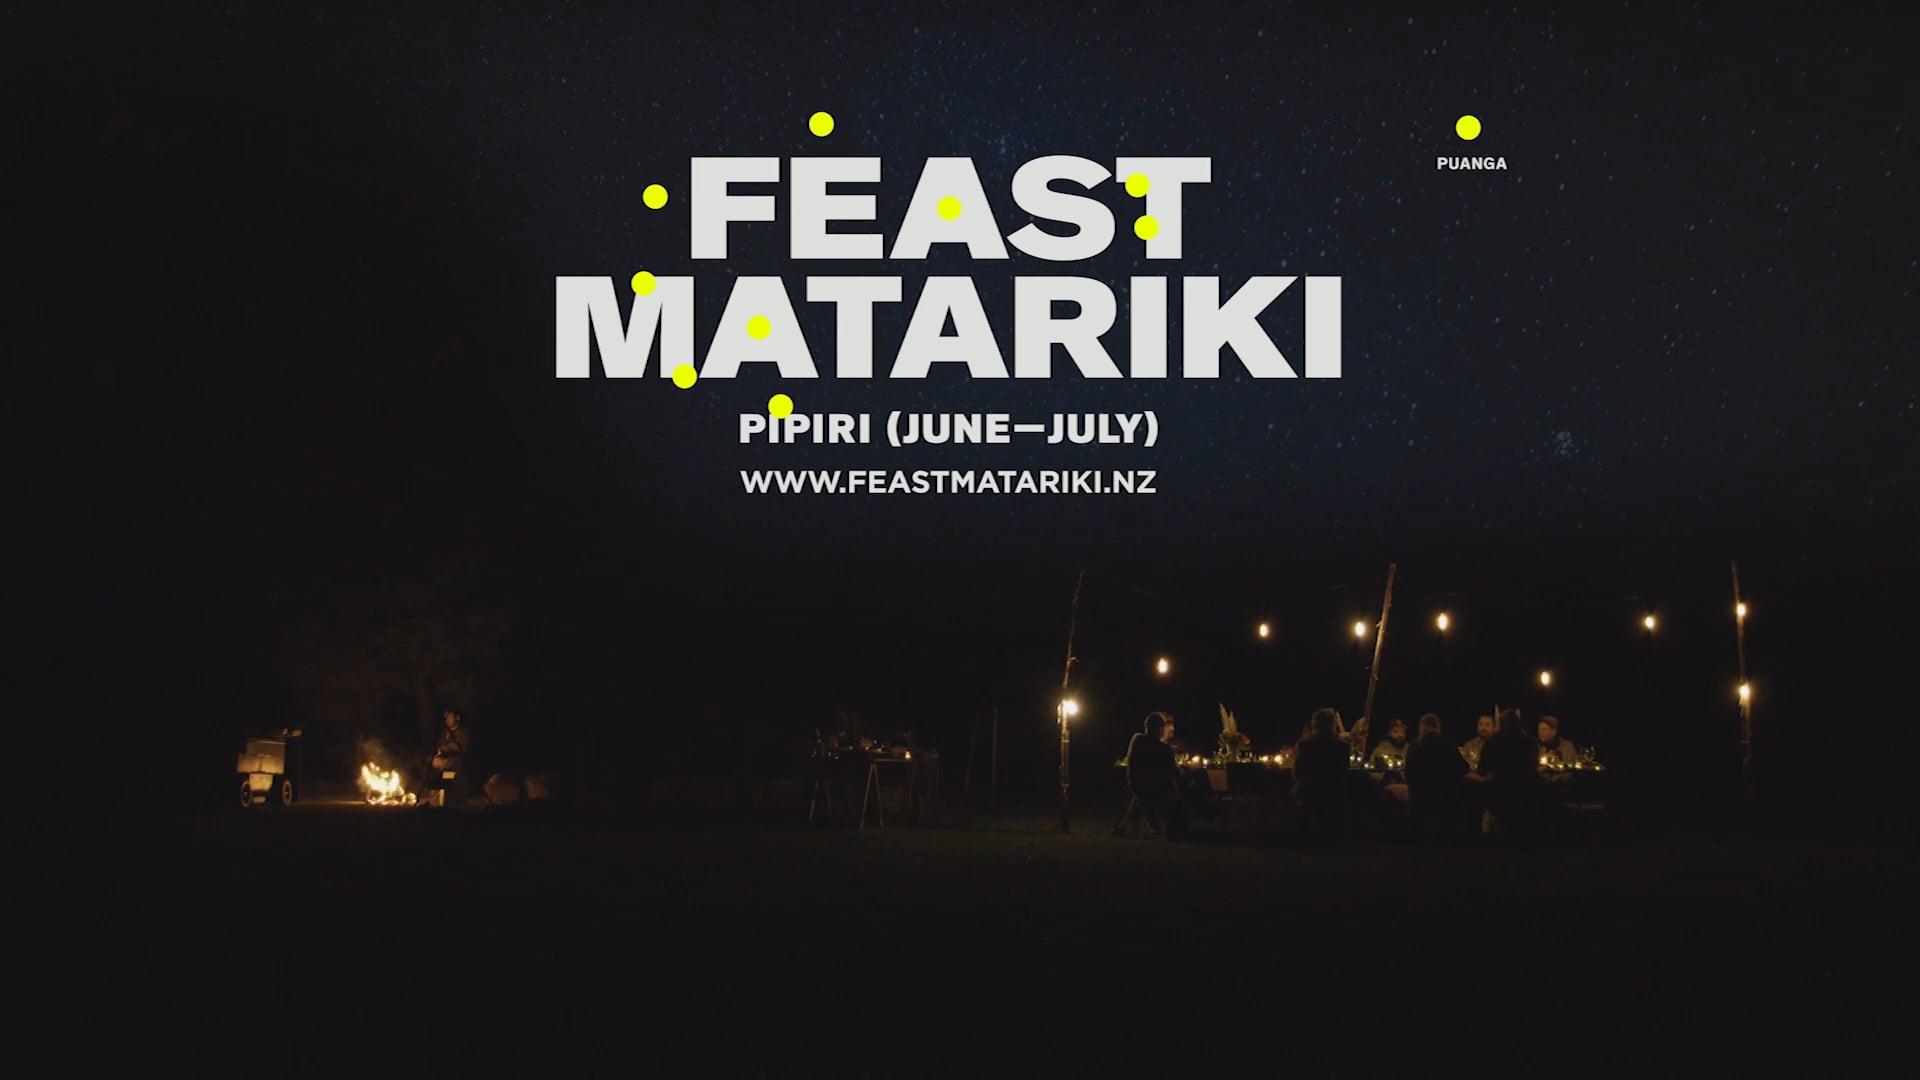 Feast Matariki New Zealand.